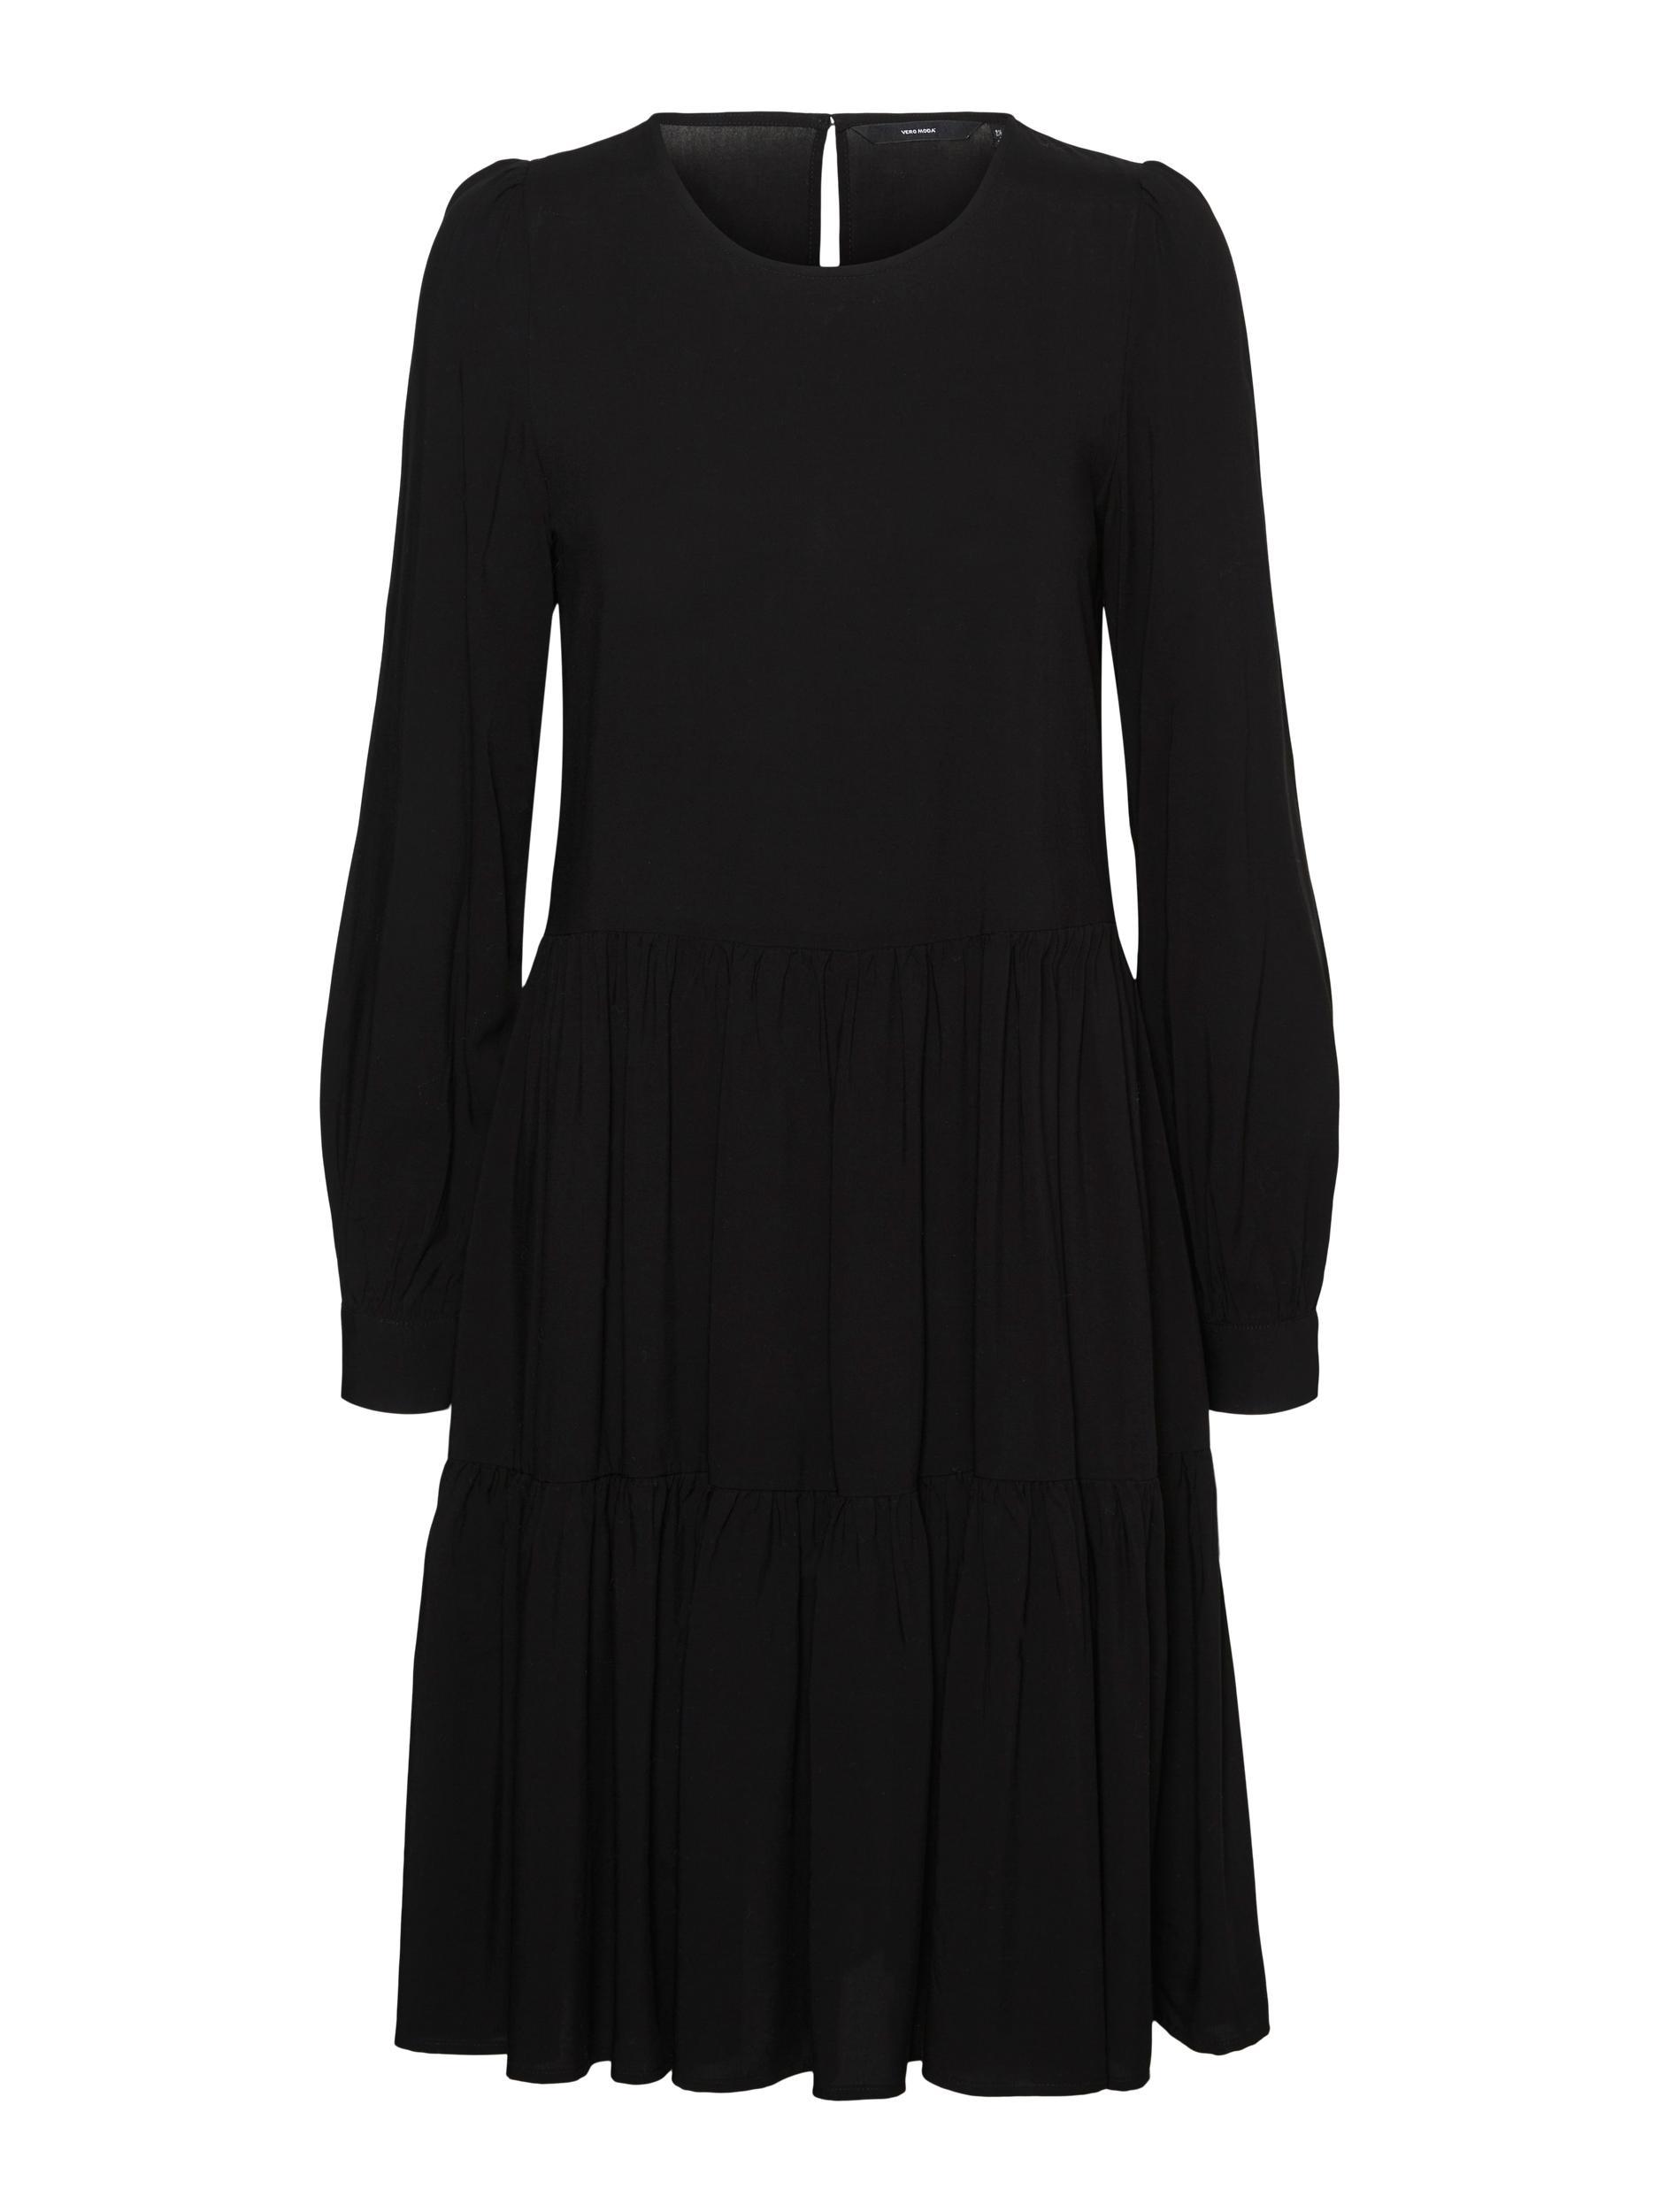 Vero Moda Nads LS kjole, sort, x-small